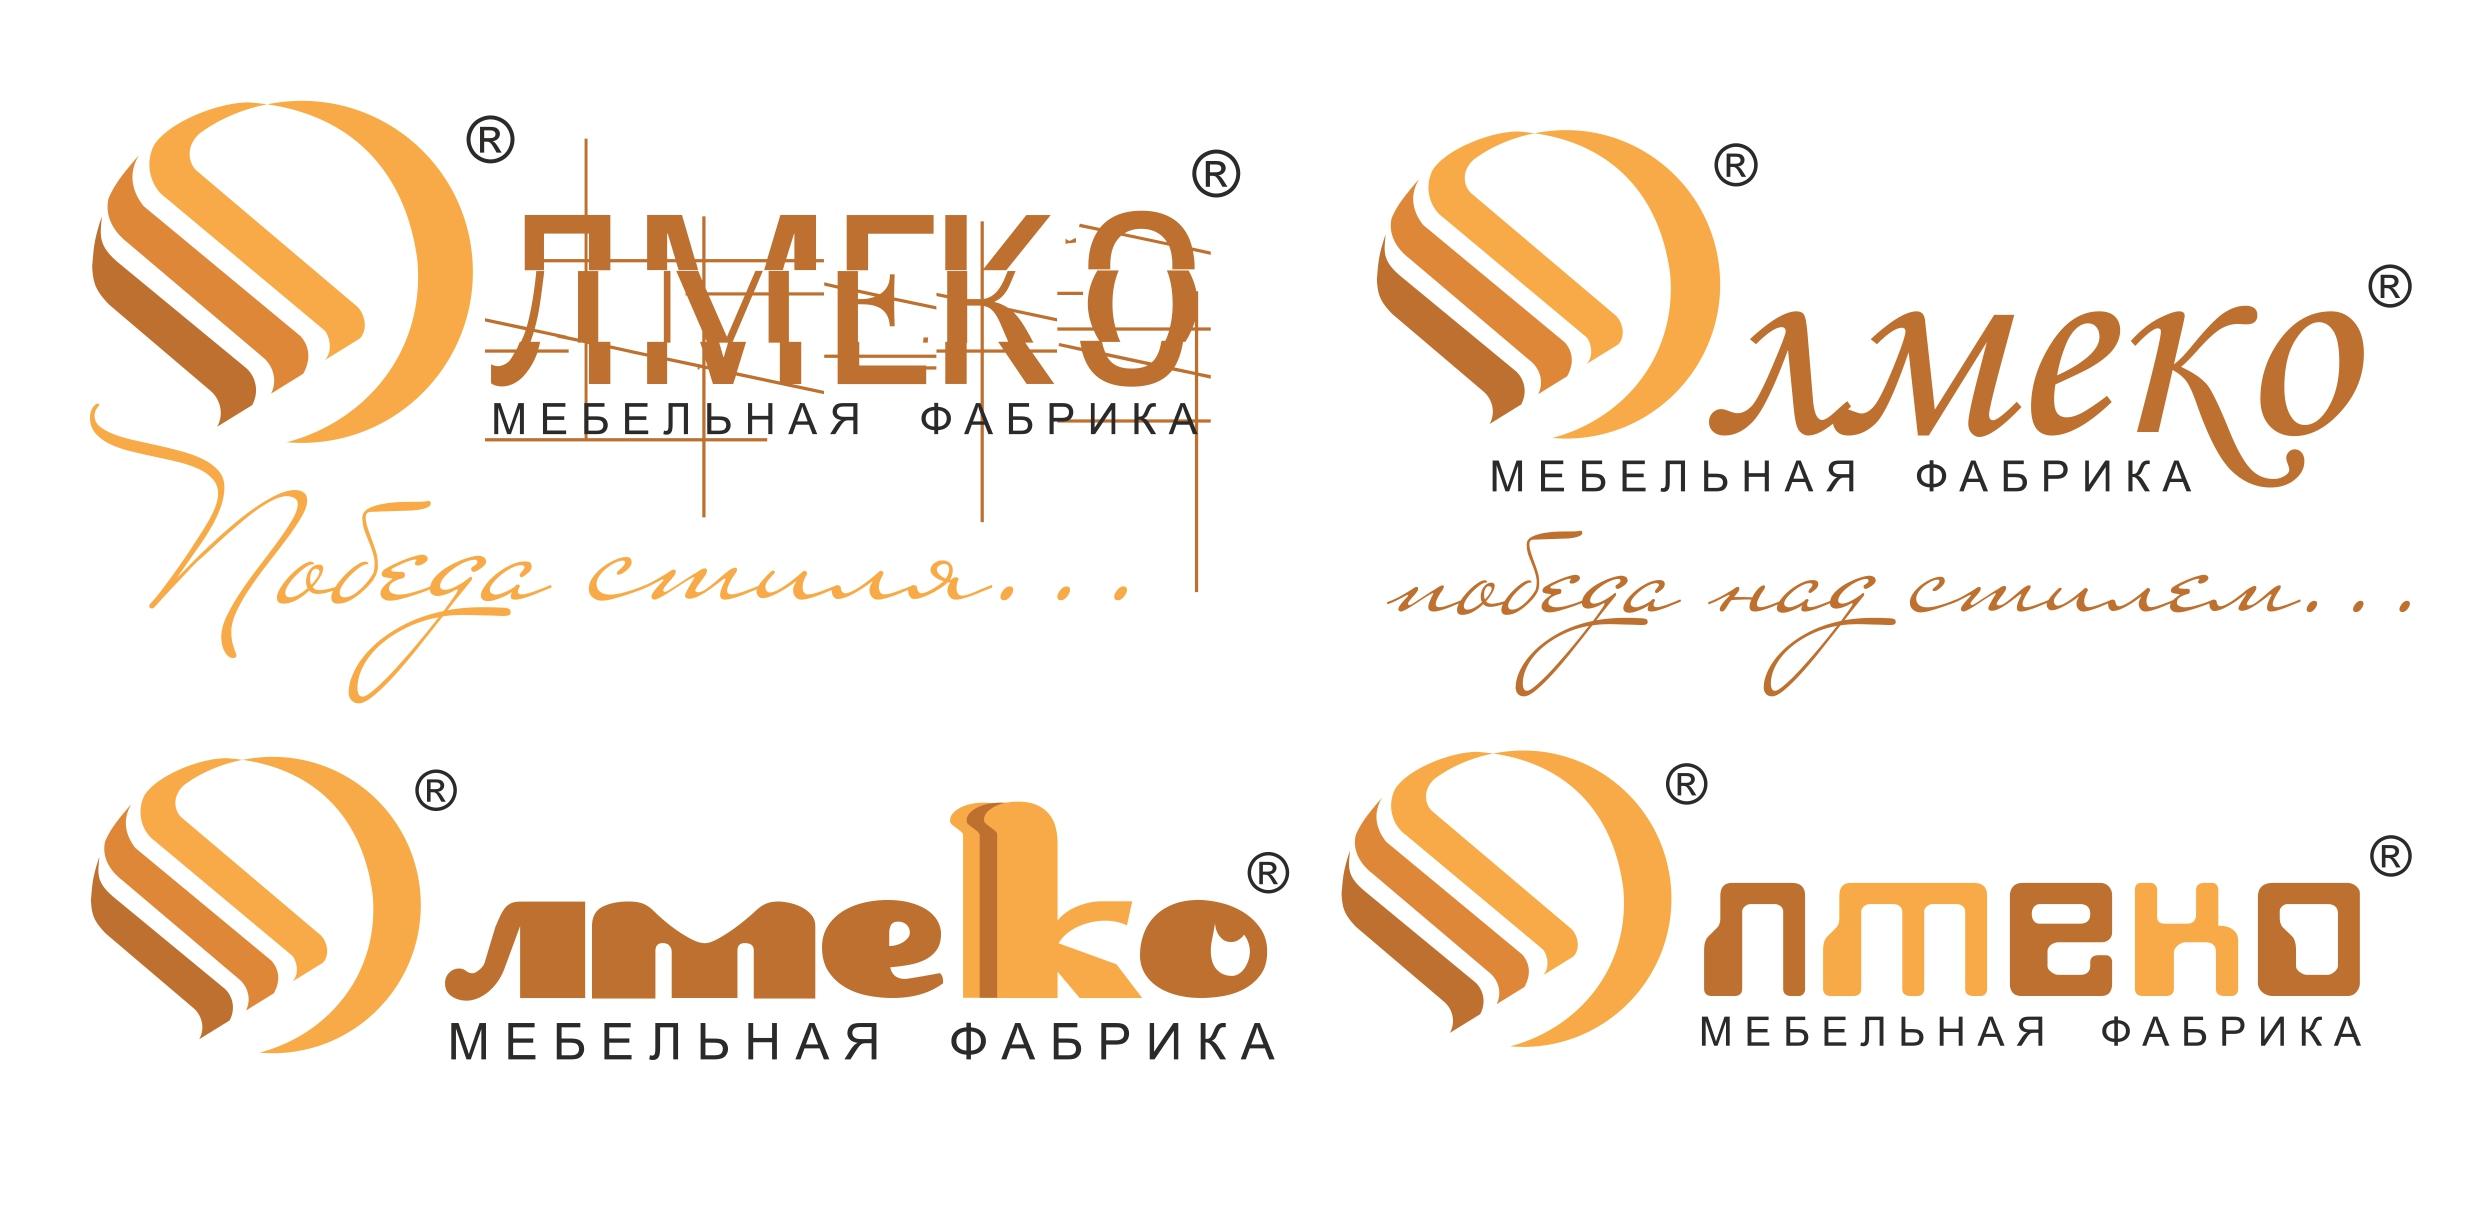 Ребрендинг/Редизайн логотипа Мебельной Фабрики фото f_16154b6c4f50f043.jpg